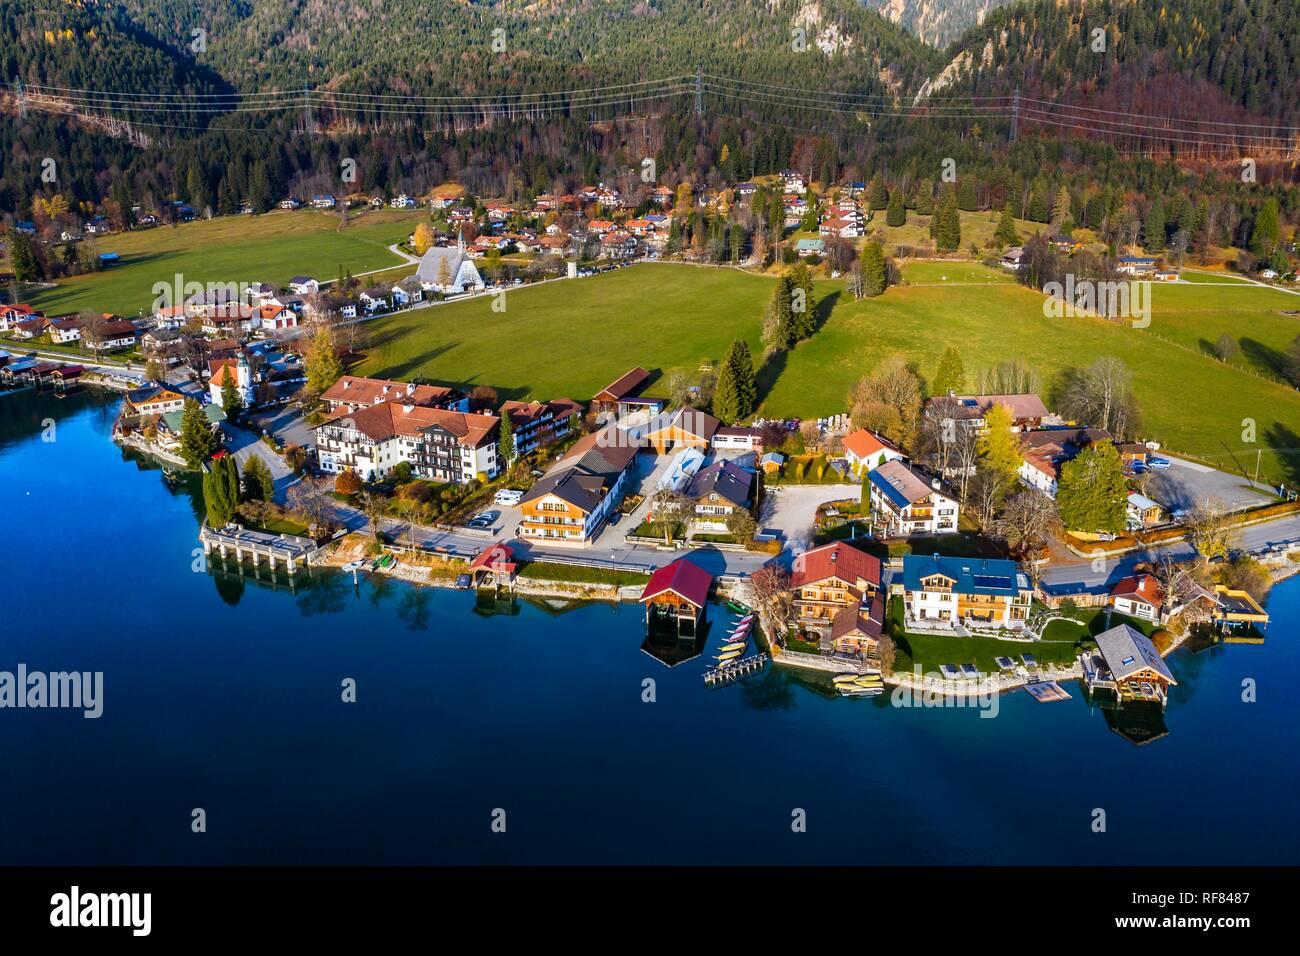 Drone shot, Walchensee, Upper Bavaria, Bavaria, Germany - Stock Image